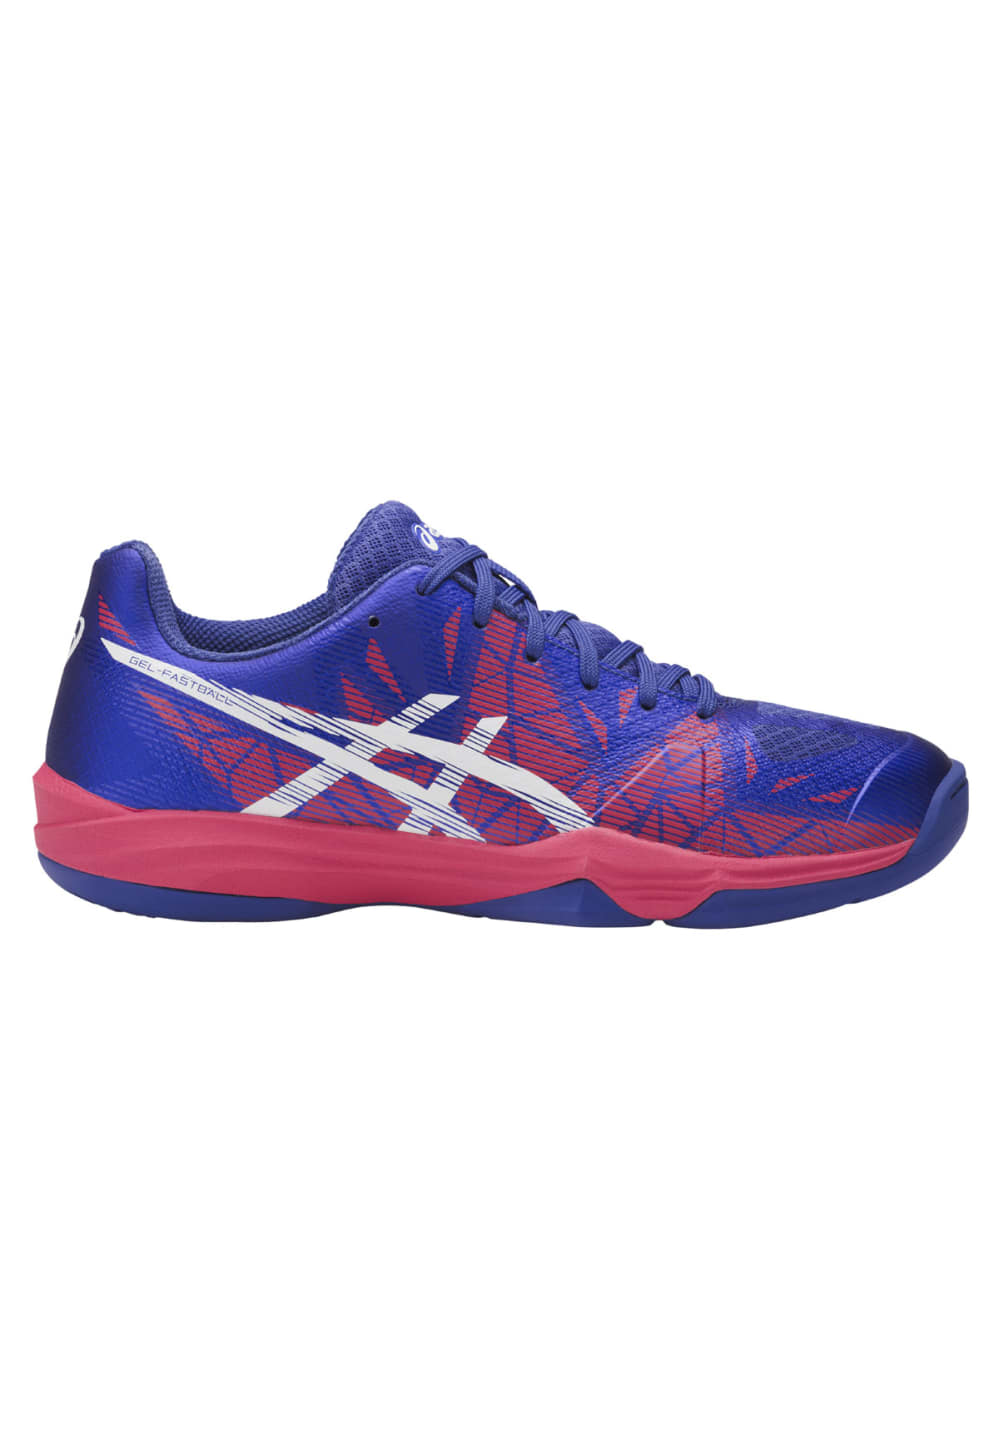 chaussures de séparation df8a7 e565e ASICS GEL-Fastball 3 - Handball shoes for Women - Blue